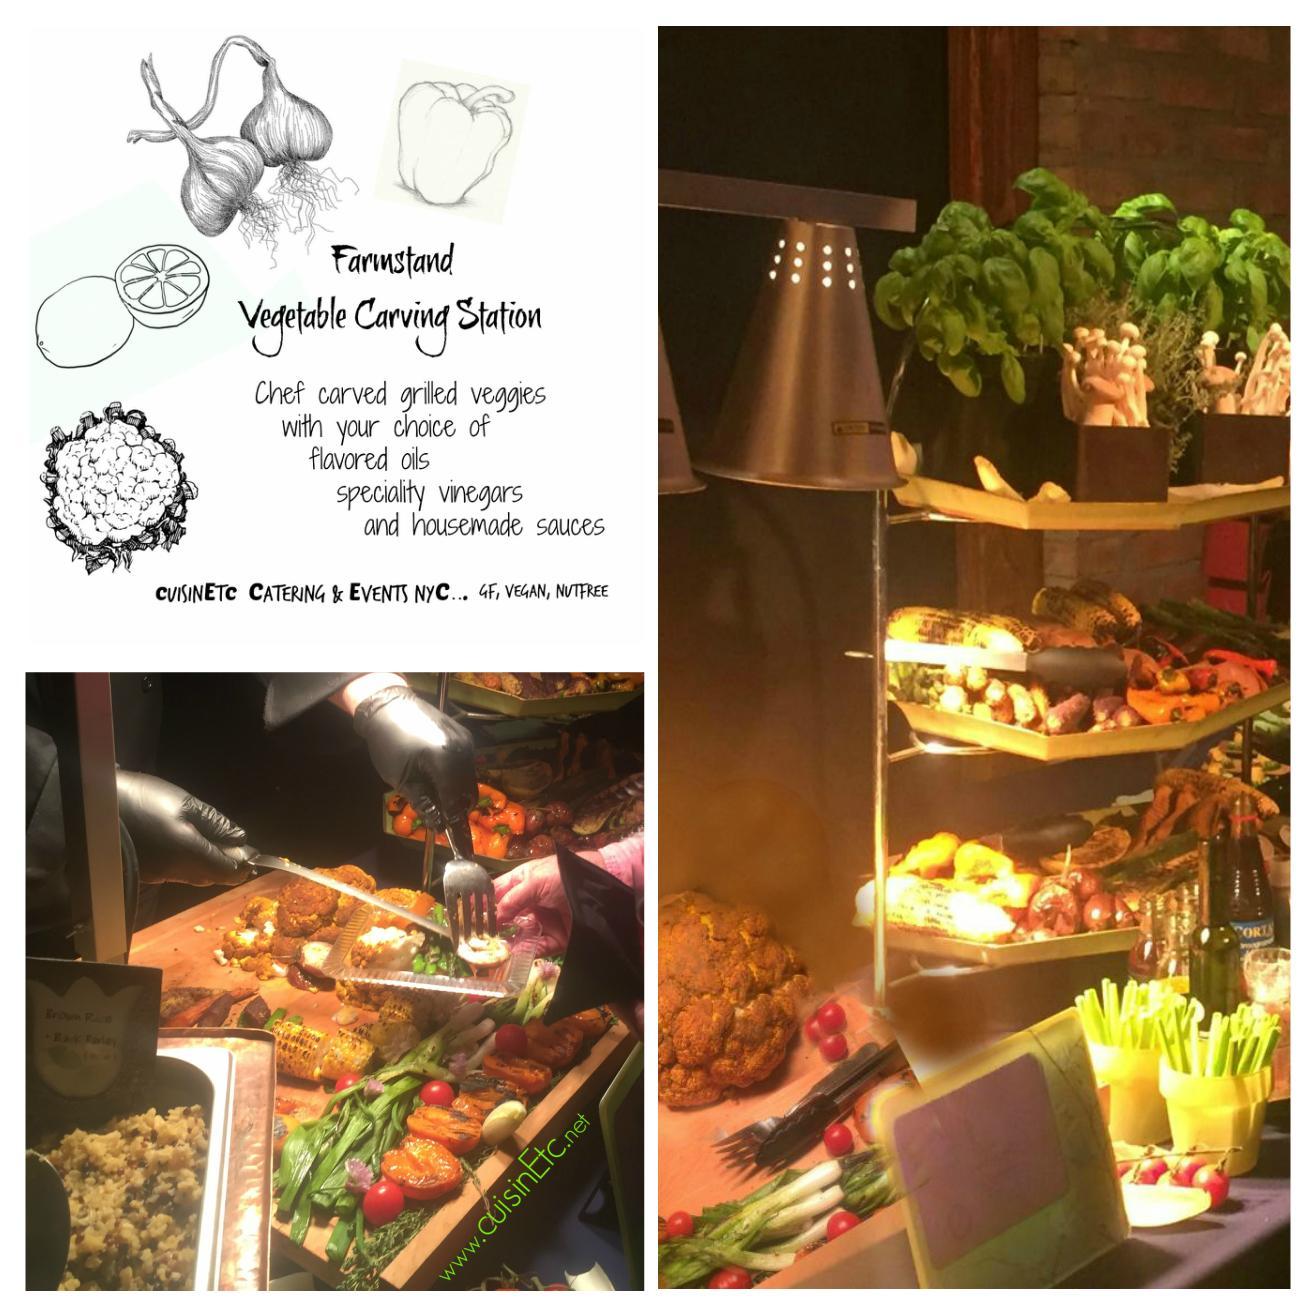 Vegan Wedding Food: A Culinary Journey Via Catering: #vegan Plant